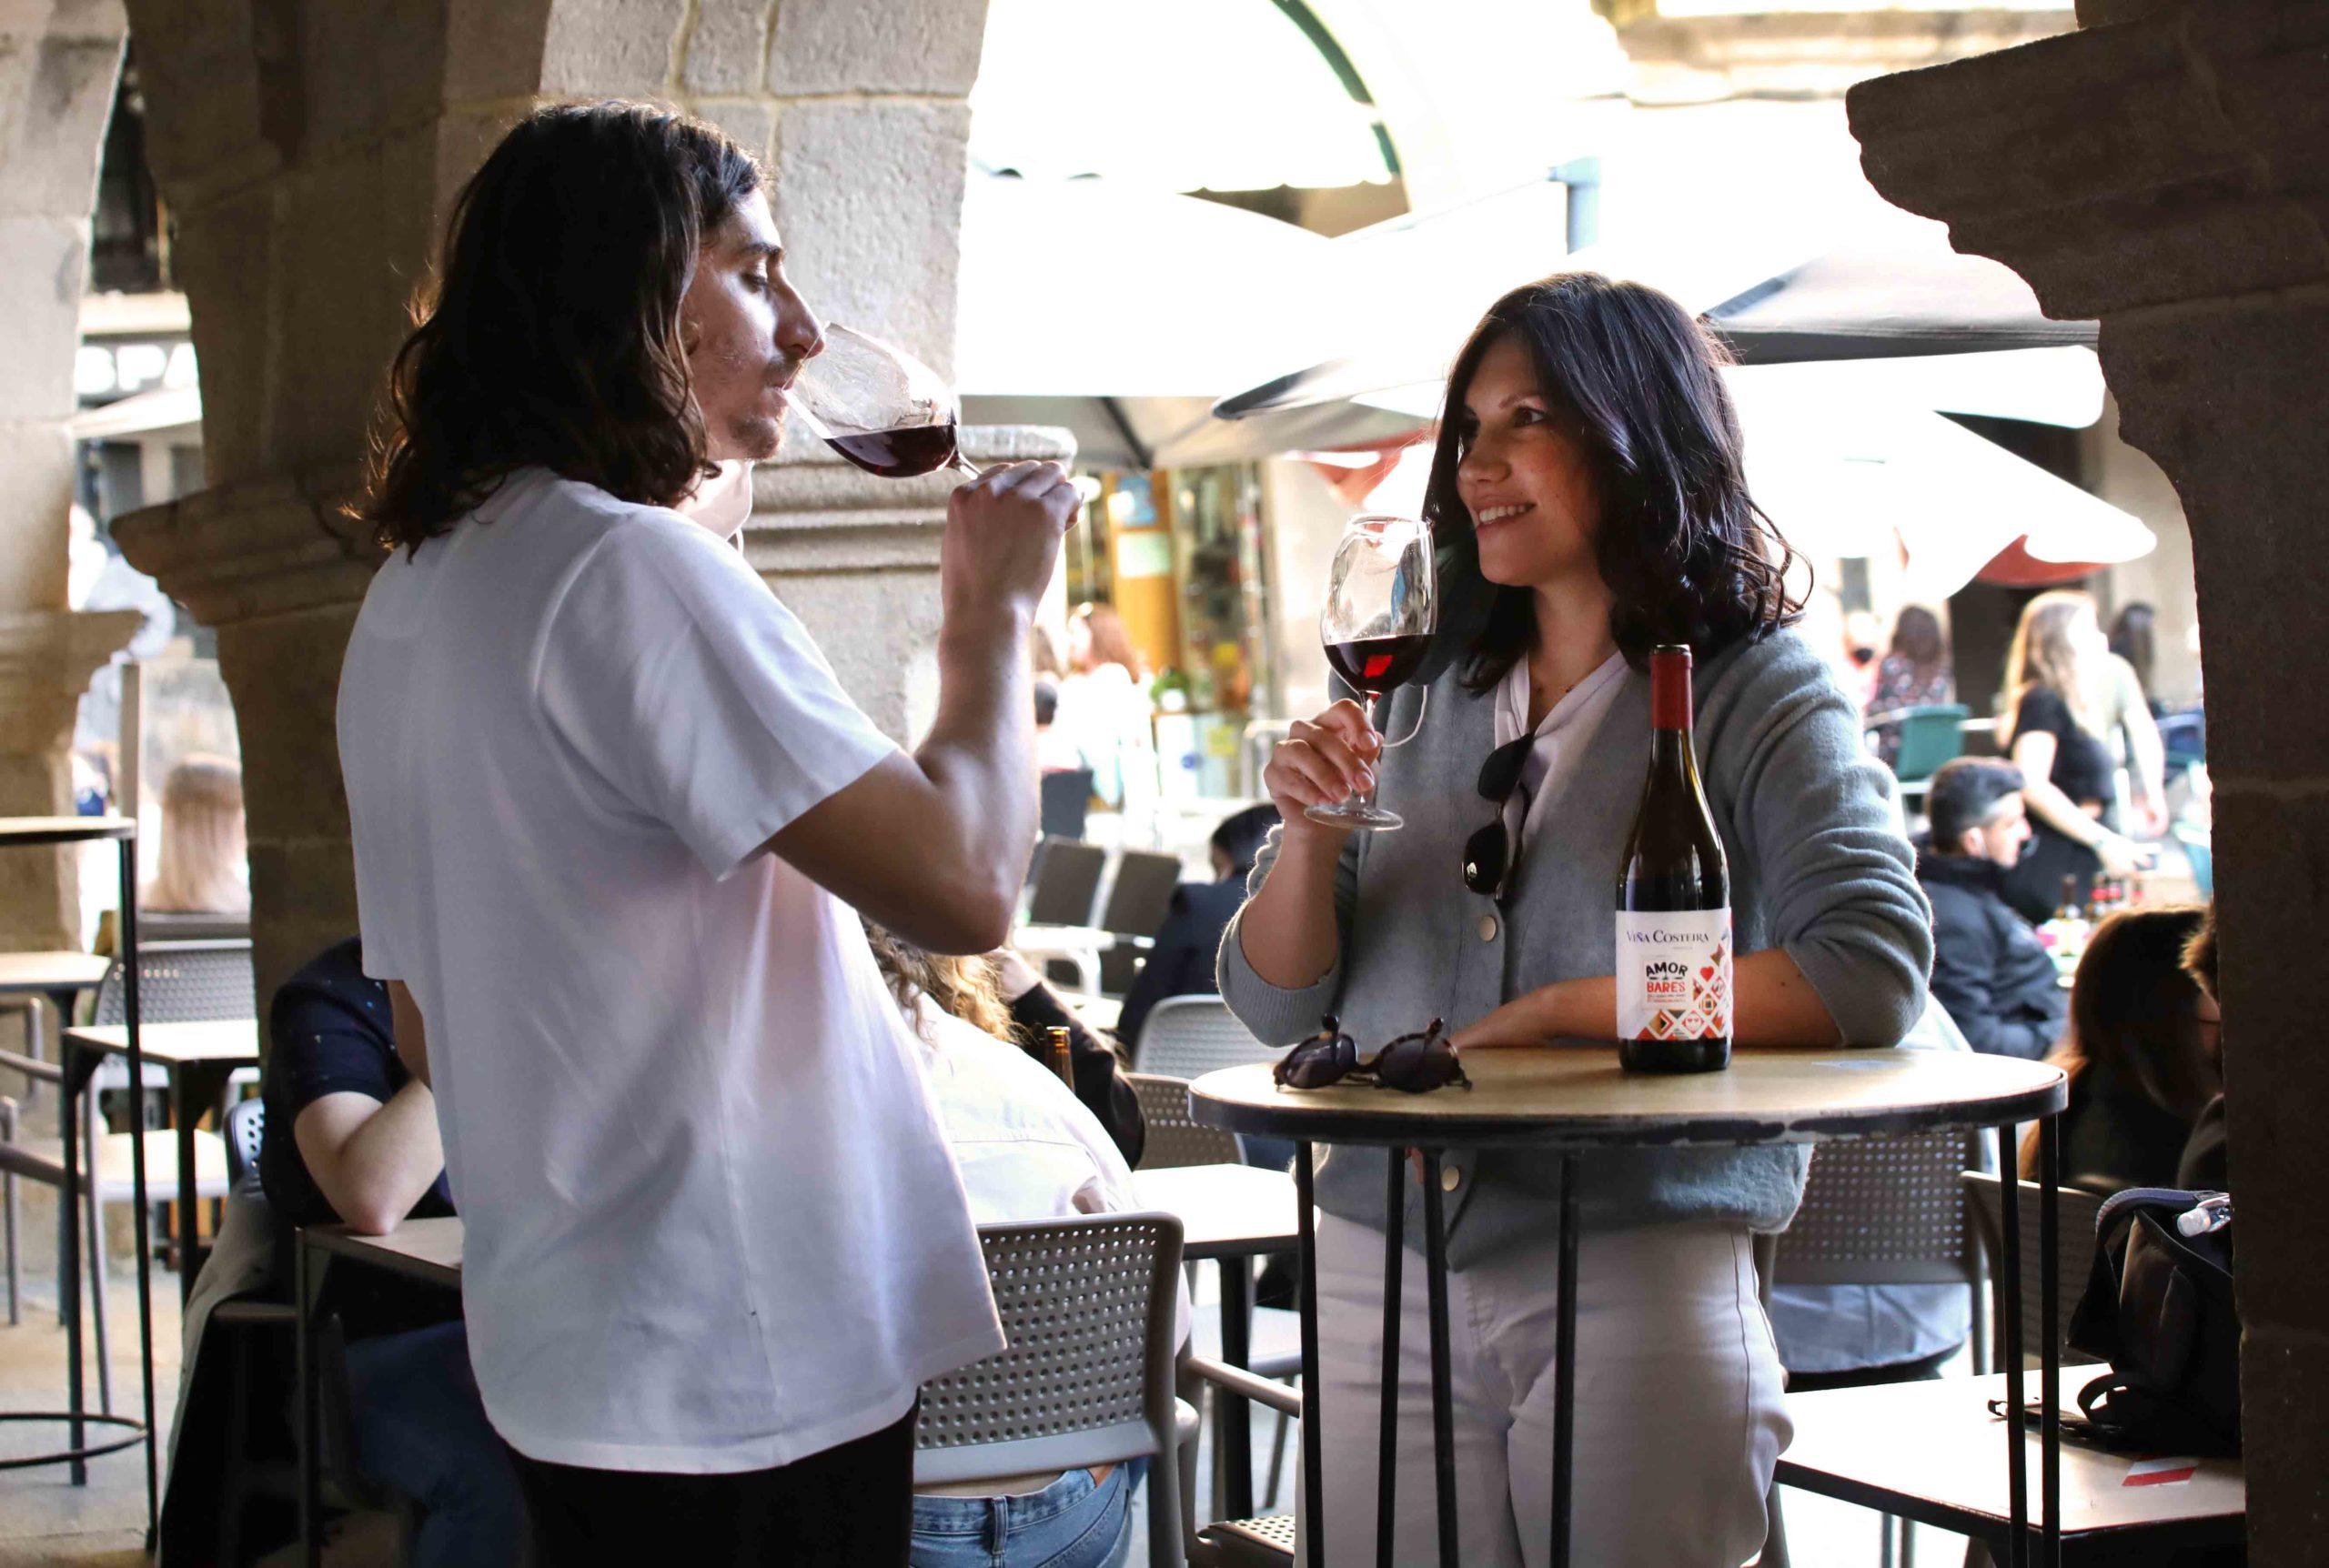 Viña Costeira continúa su apoyo a la hostelería, ahora con 'Amor de Bares Mencía'